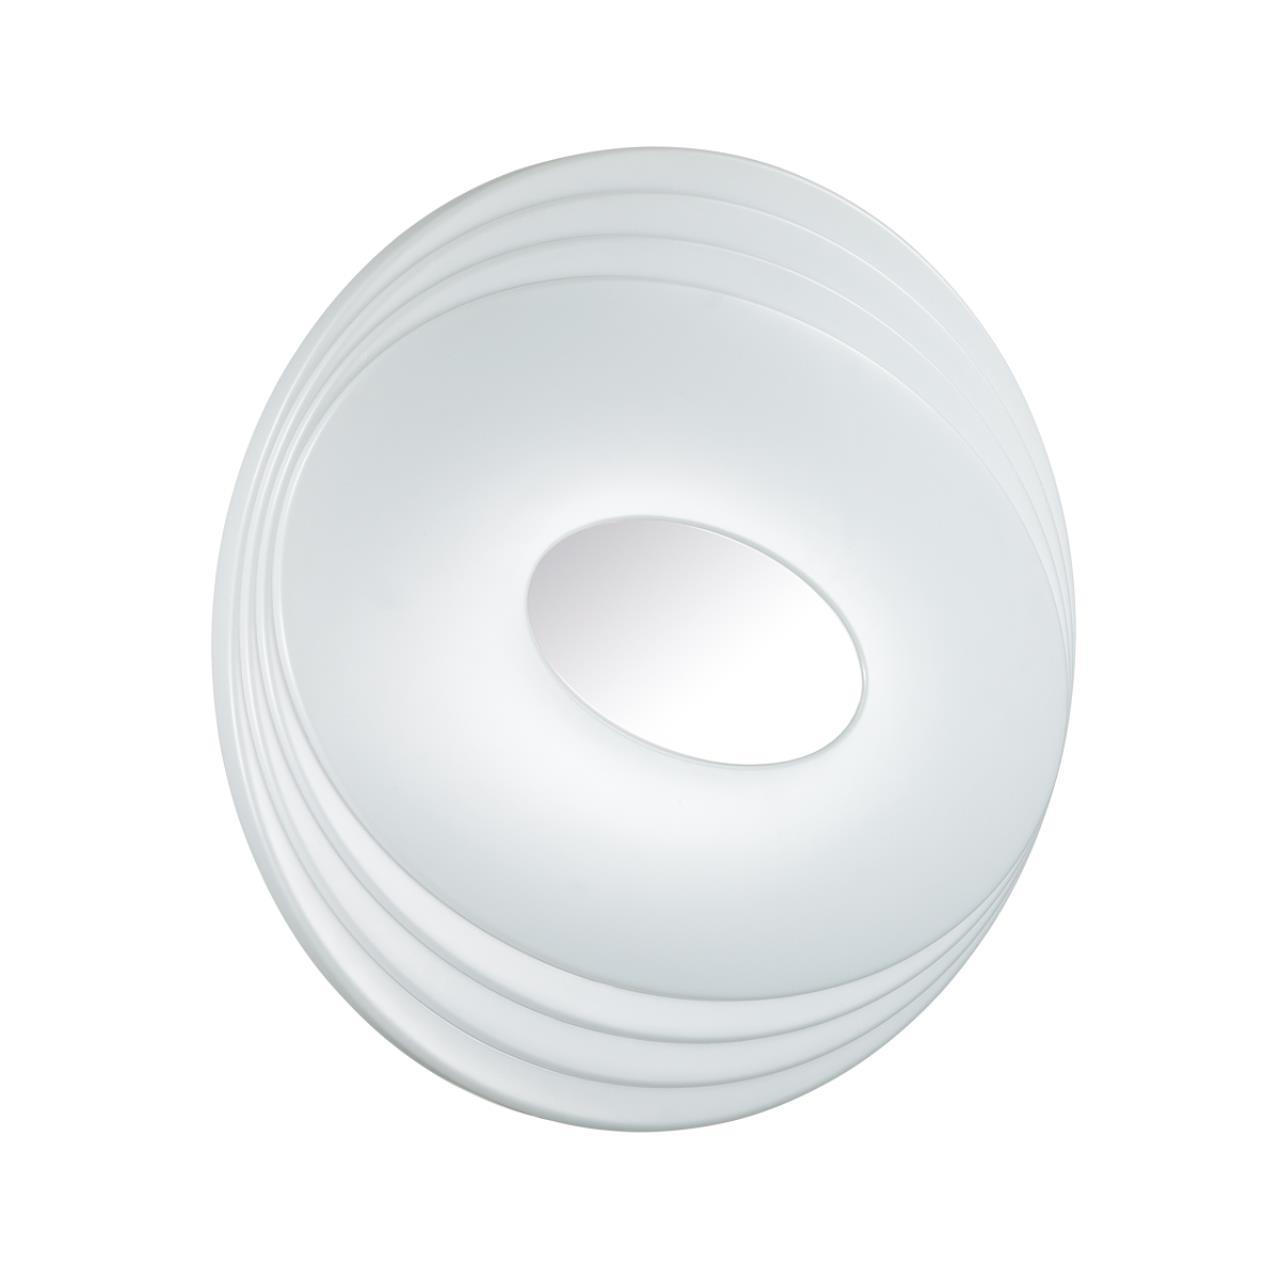 3001/DL SN 022 св-к SEKA пластик LED 48Вт 3000-6000K D380 IP43 пульт ДУ